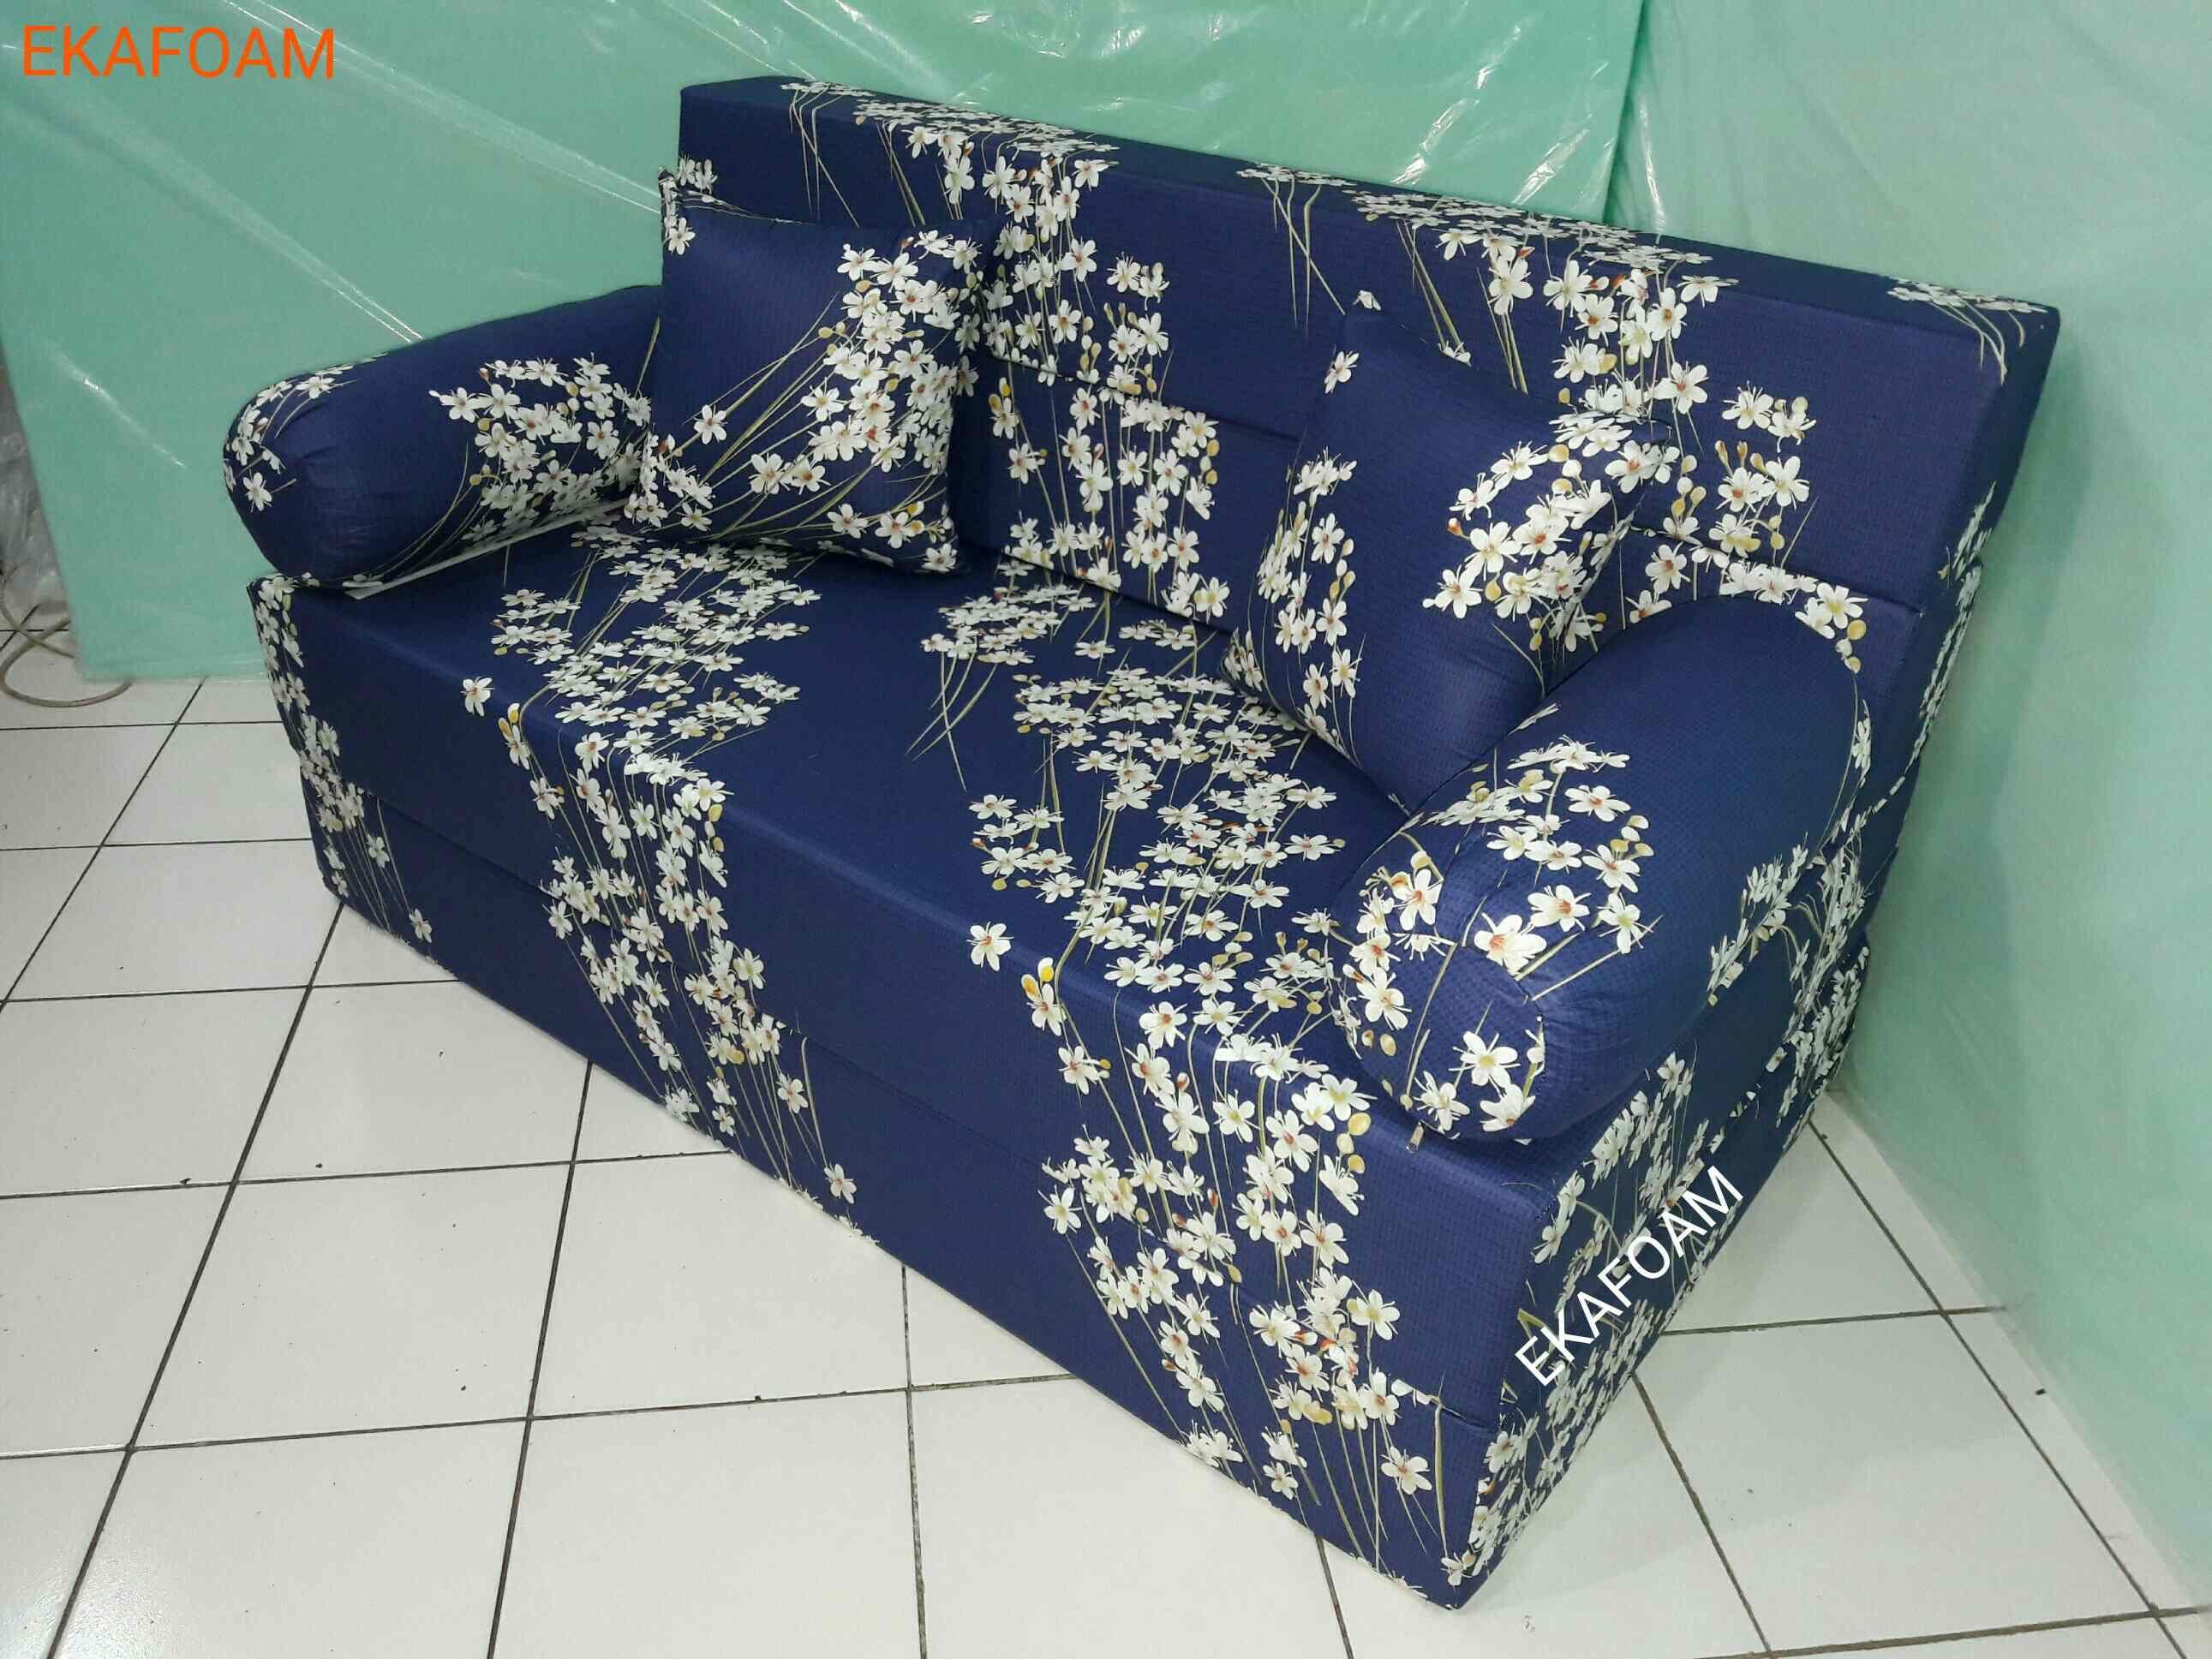 Sofa Bed Inoac Terbaru 2016 Motif BUNGA RANDU Saat Di Fungsikan